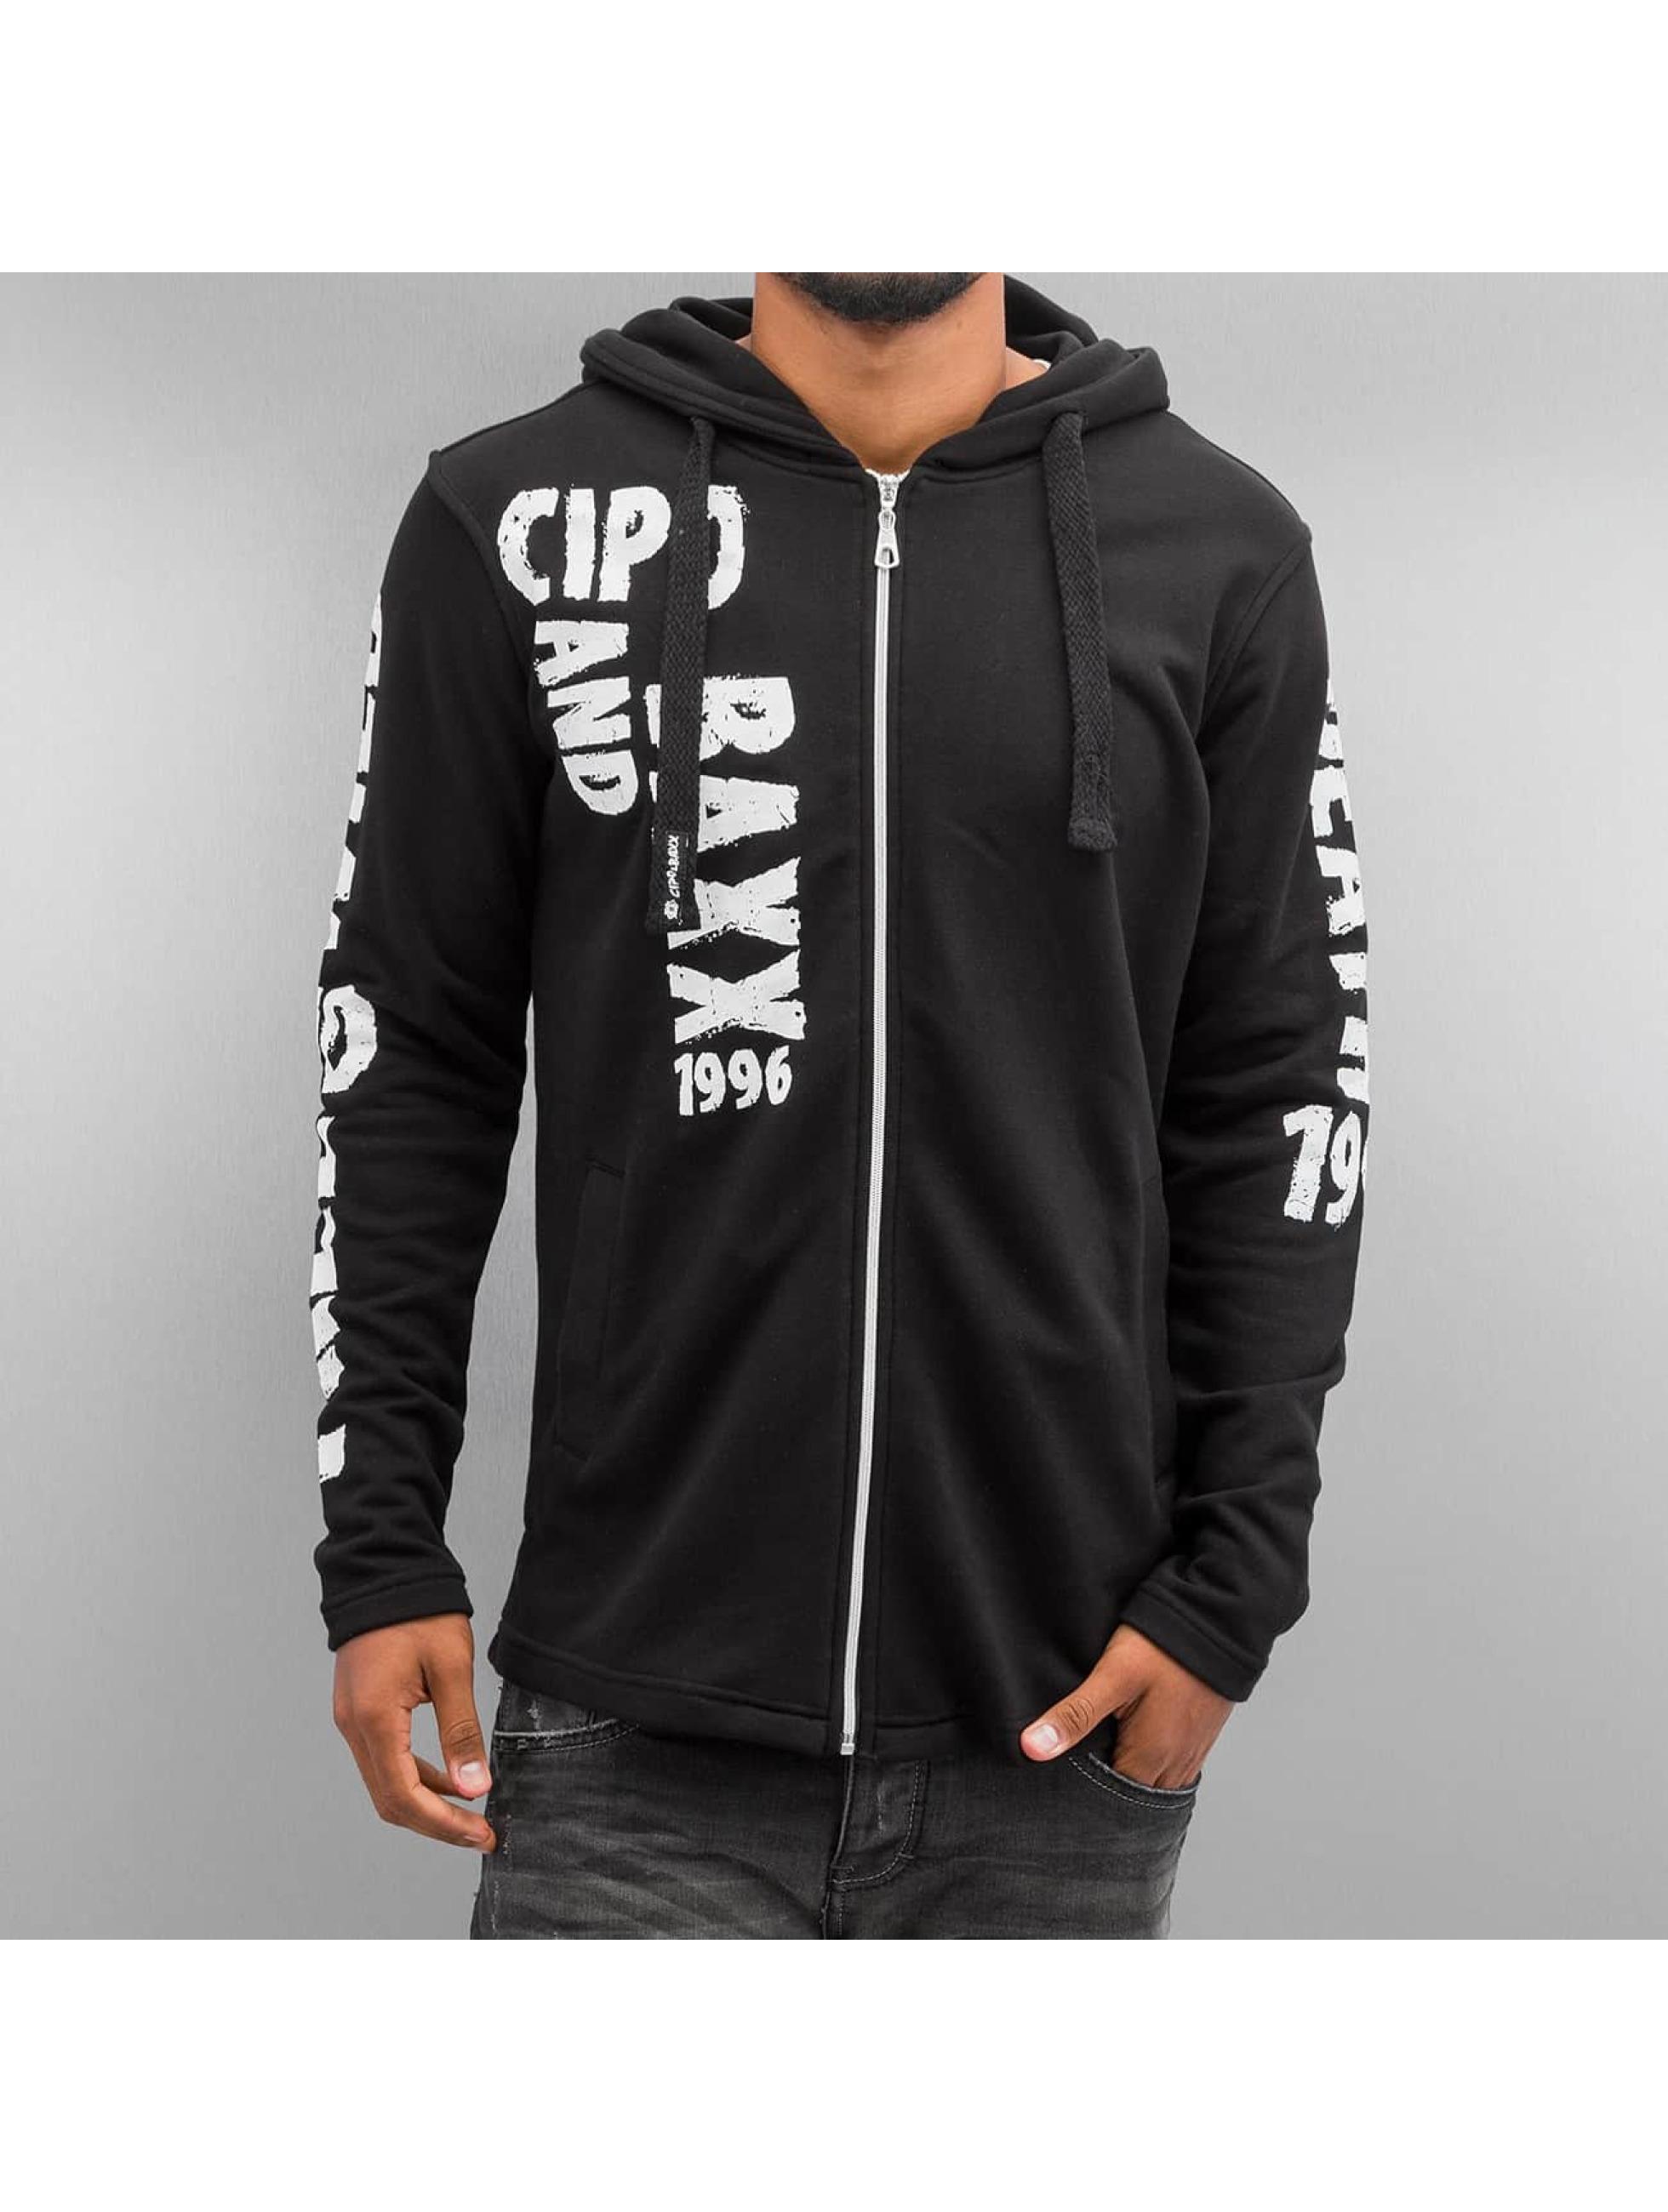 Cipo & Baxx Zip Hoodie Free And Wild black